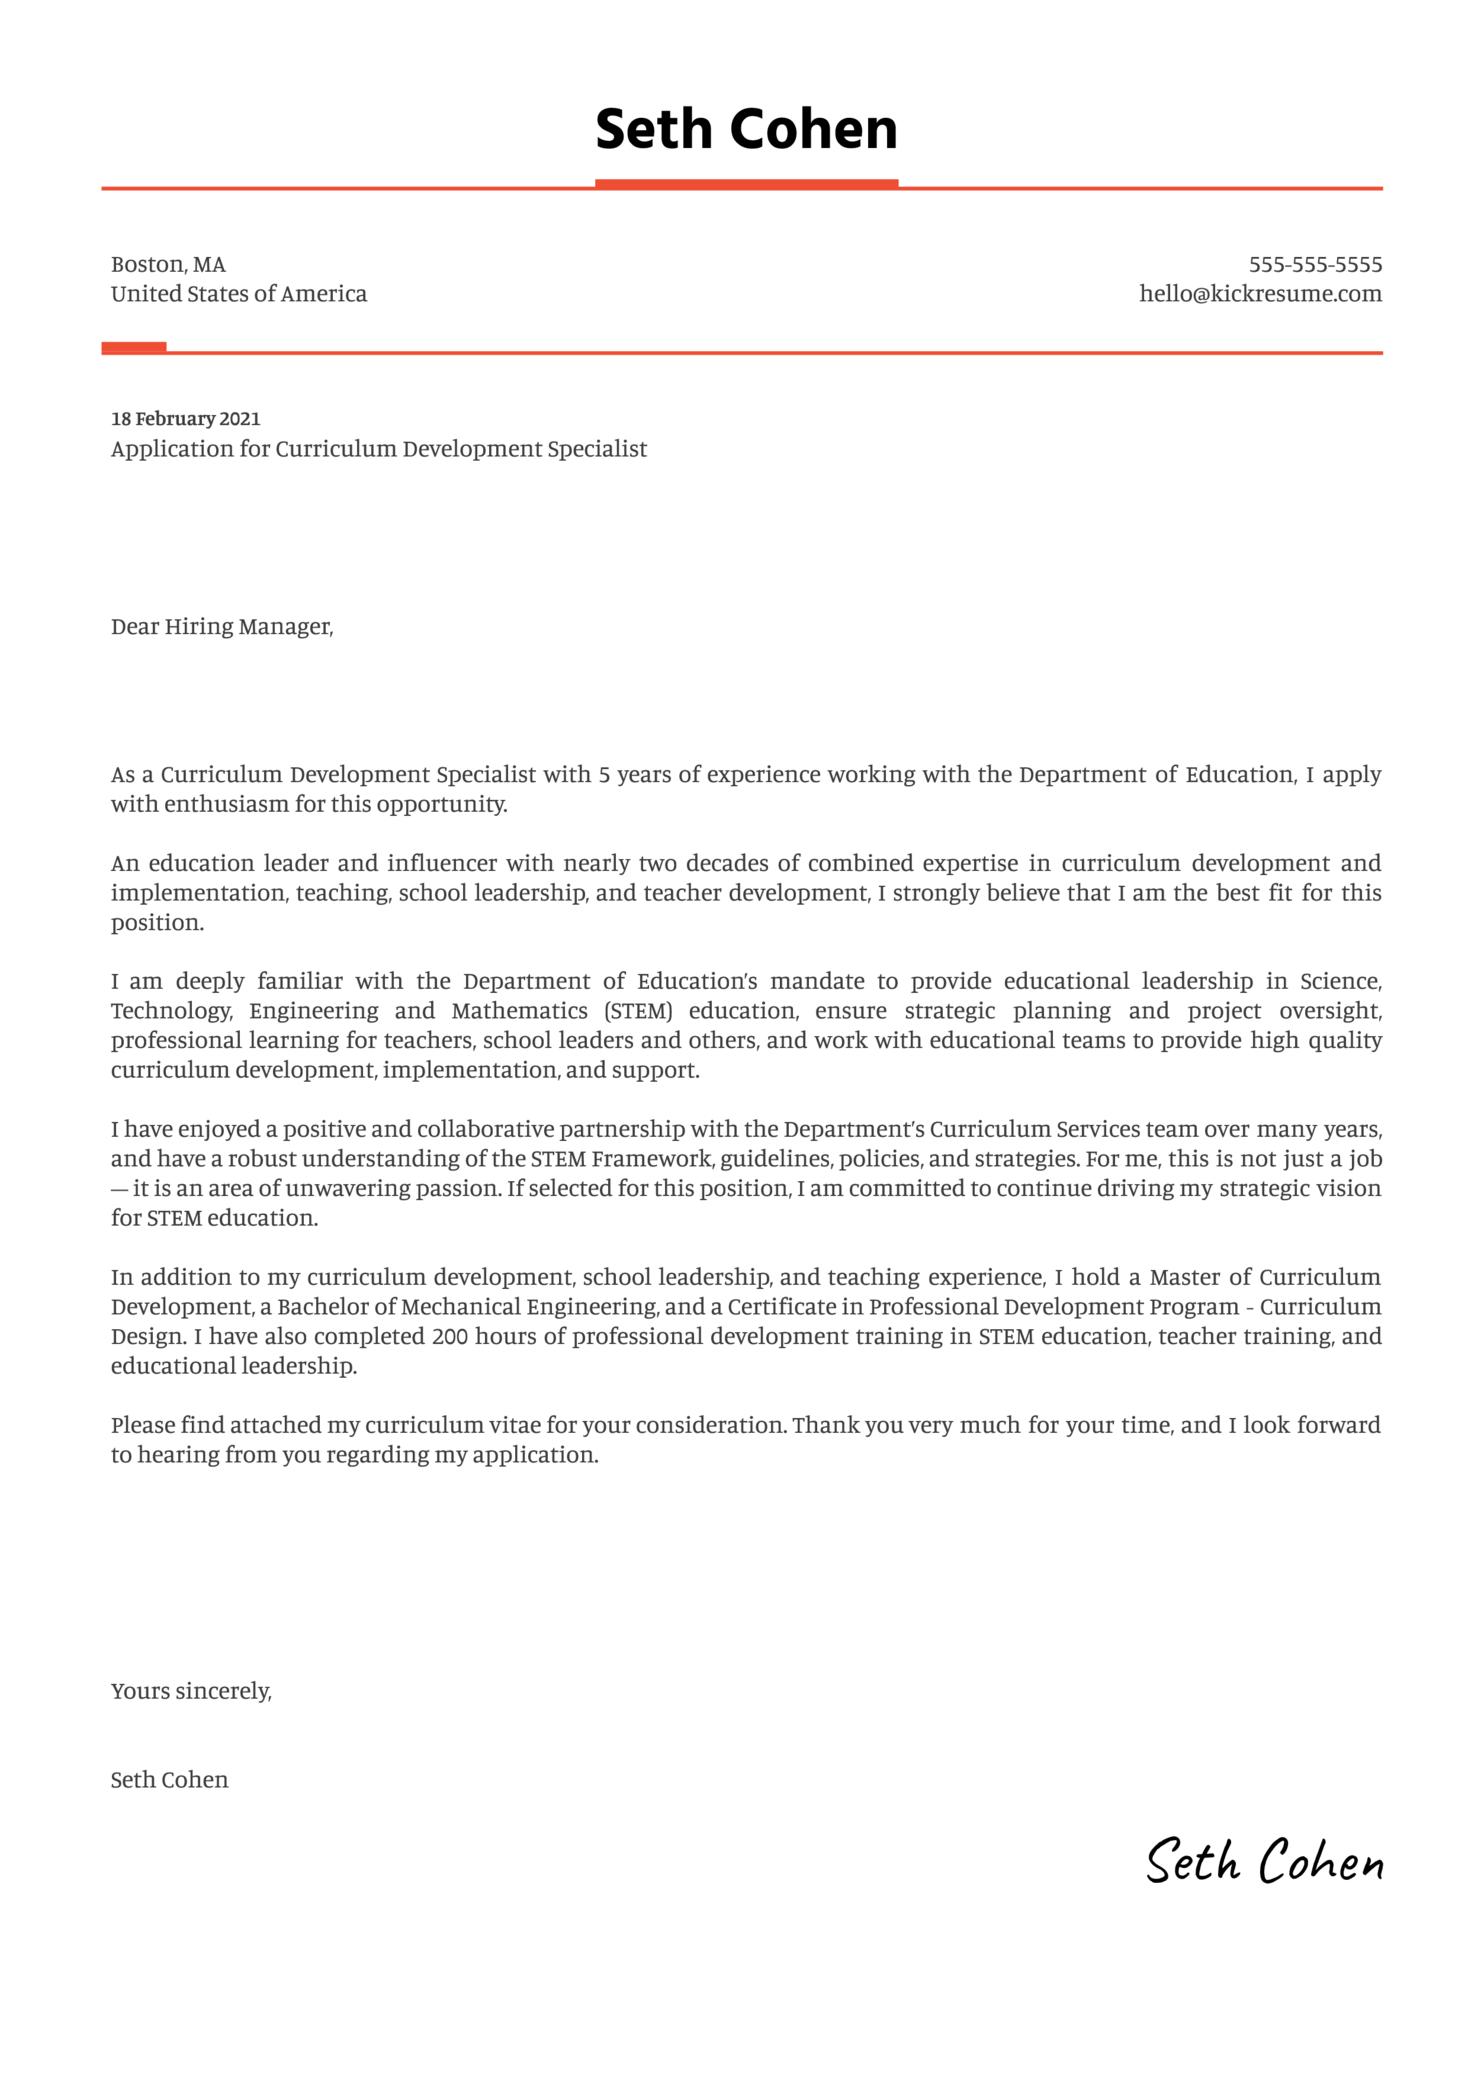 Curriculum Development Specialist Cover Letter Template